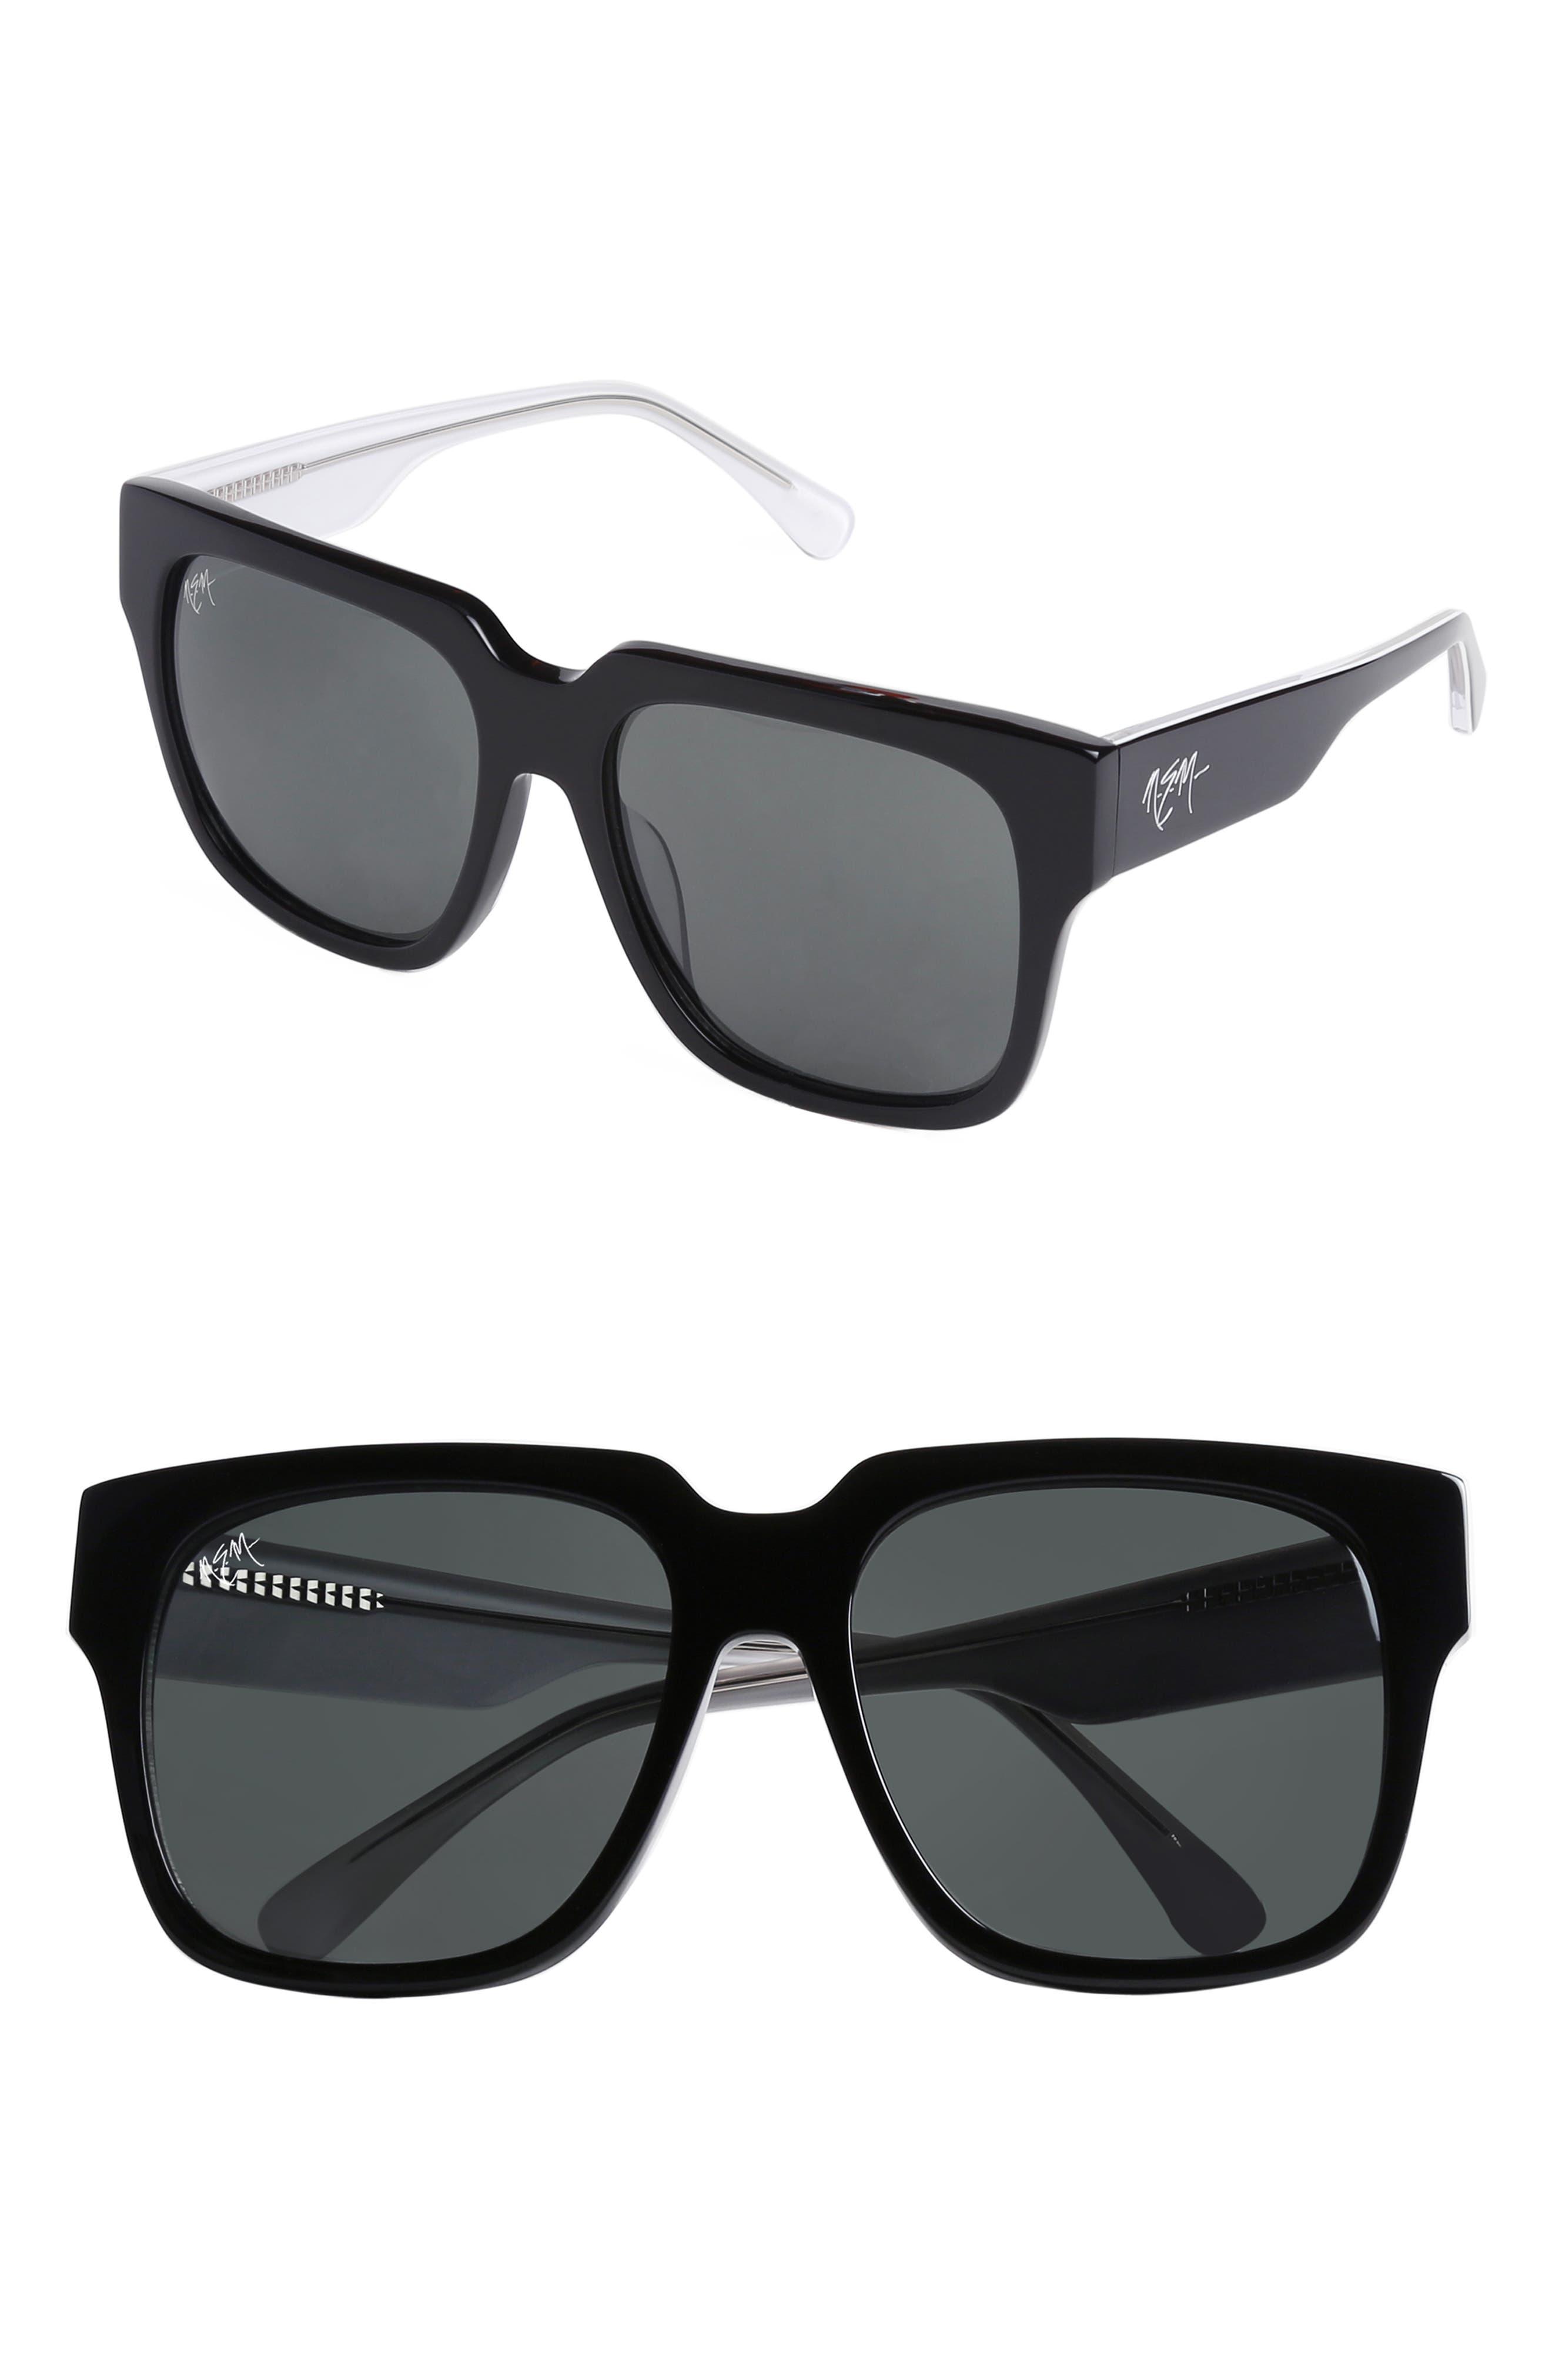 55mm Square Sunglasses,                             Main thumbnail 1, color,                             GLOSSY BLACK